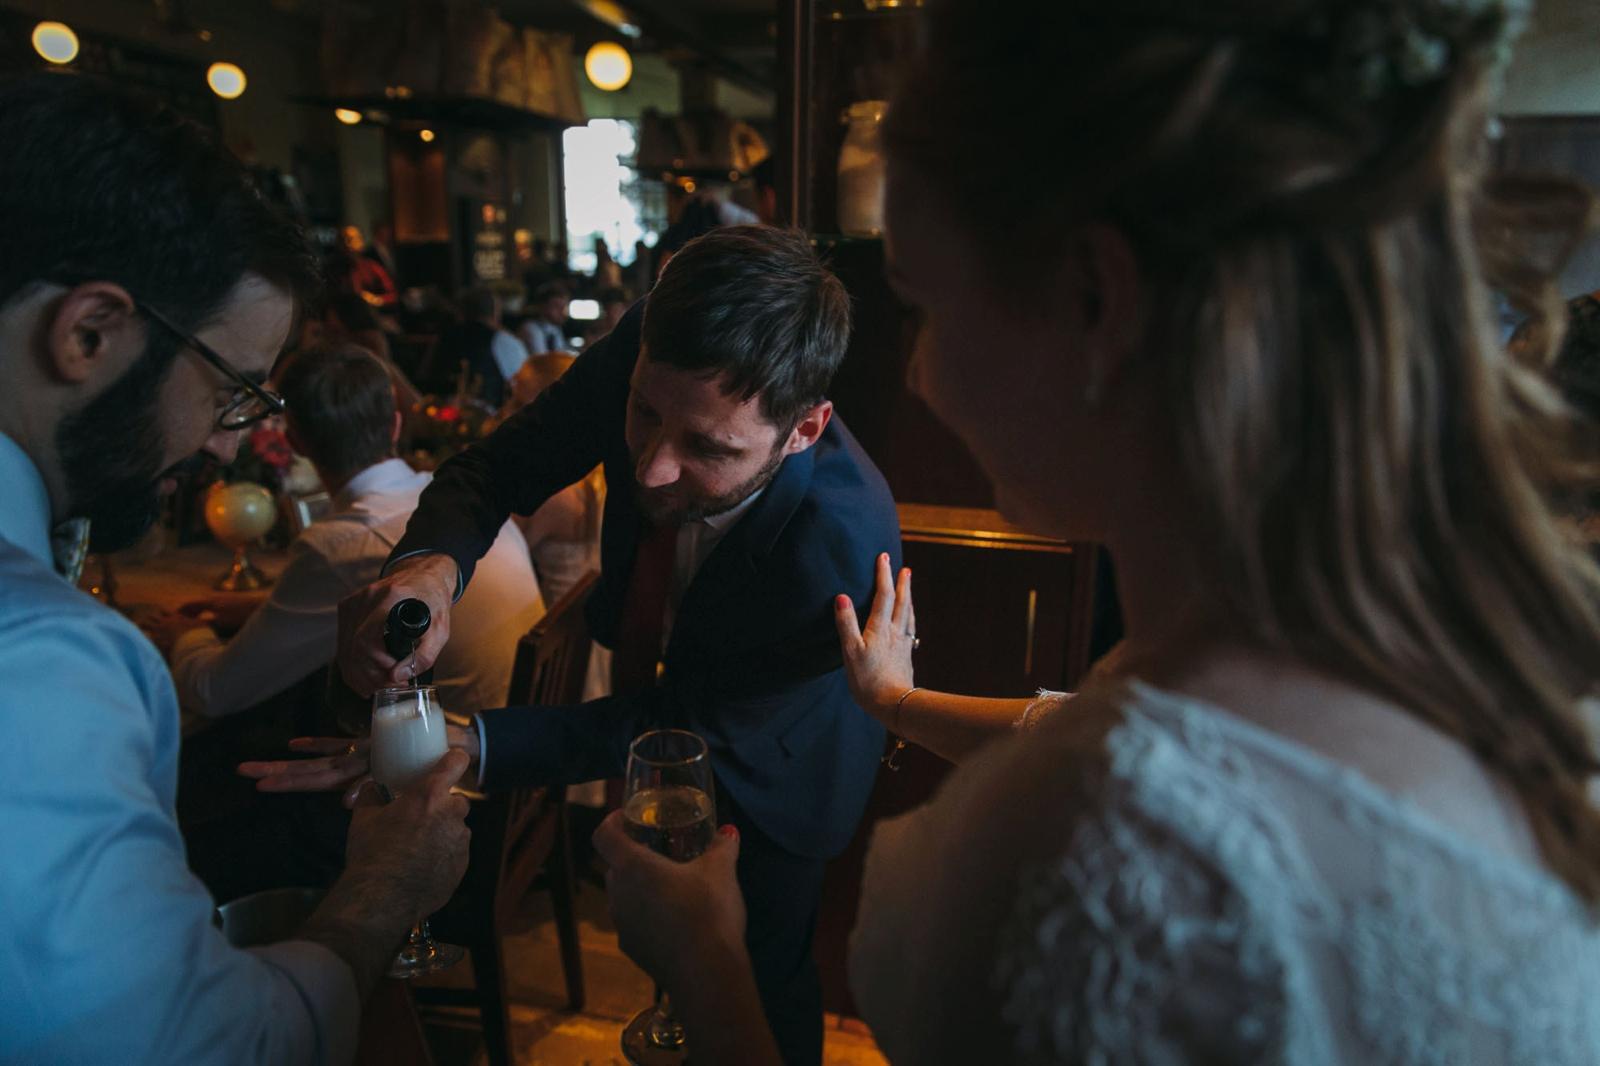 Gillian-Evan-West-Brewery-Jo-Donaldson-Photography-667.jpg